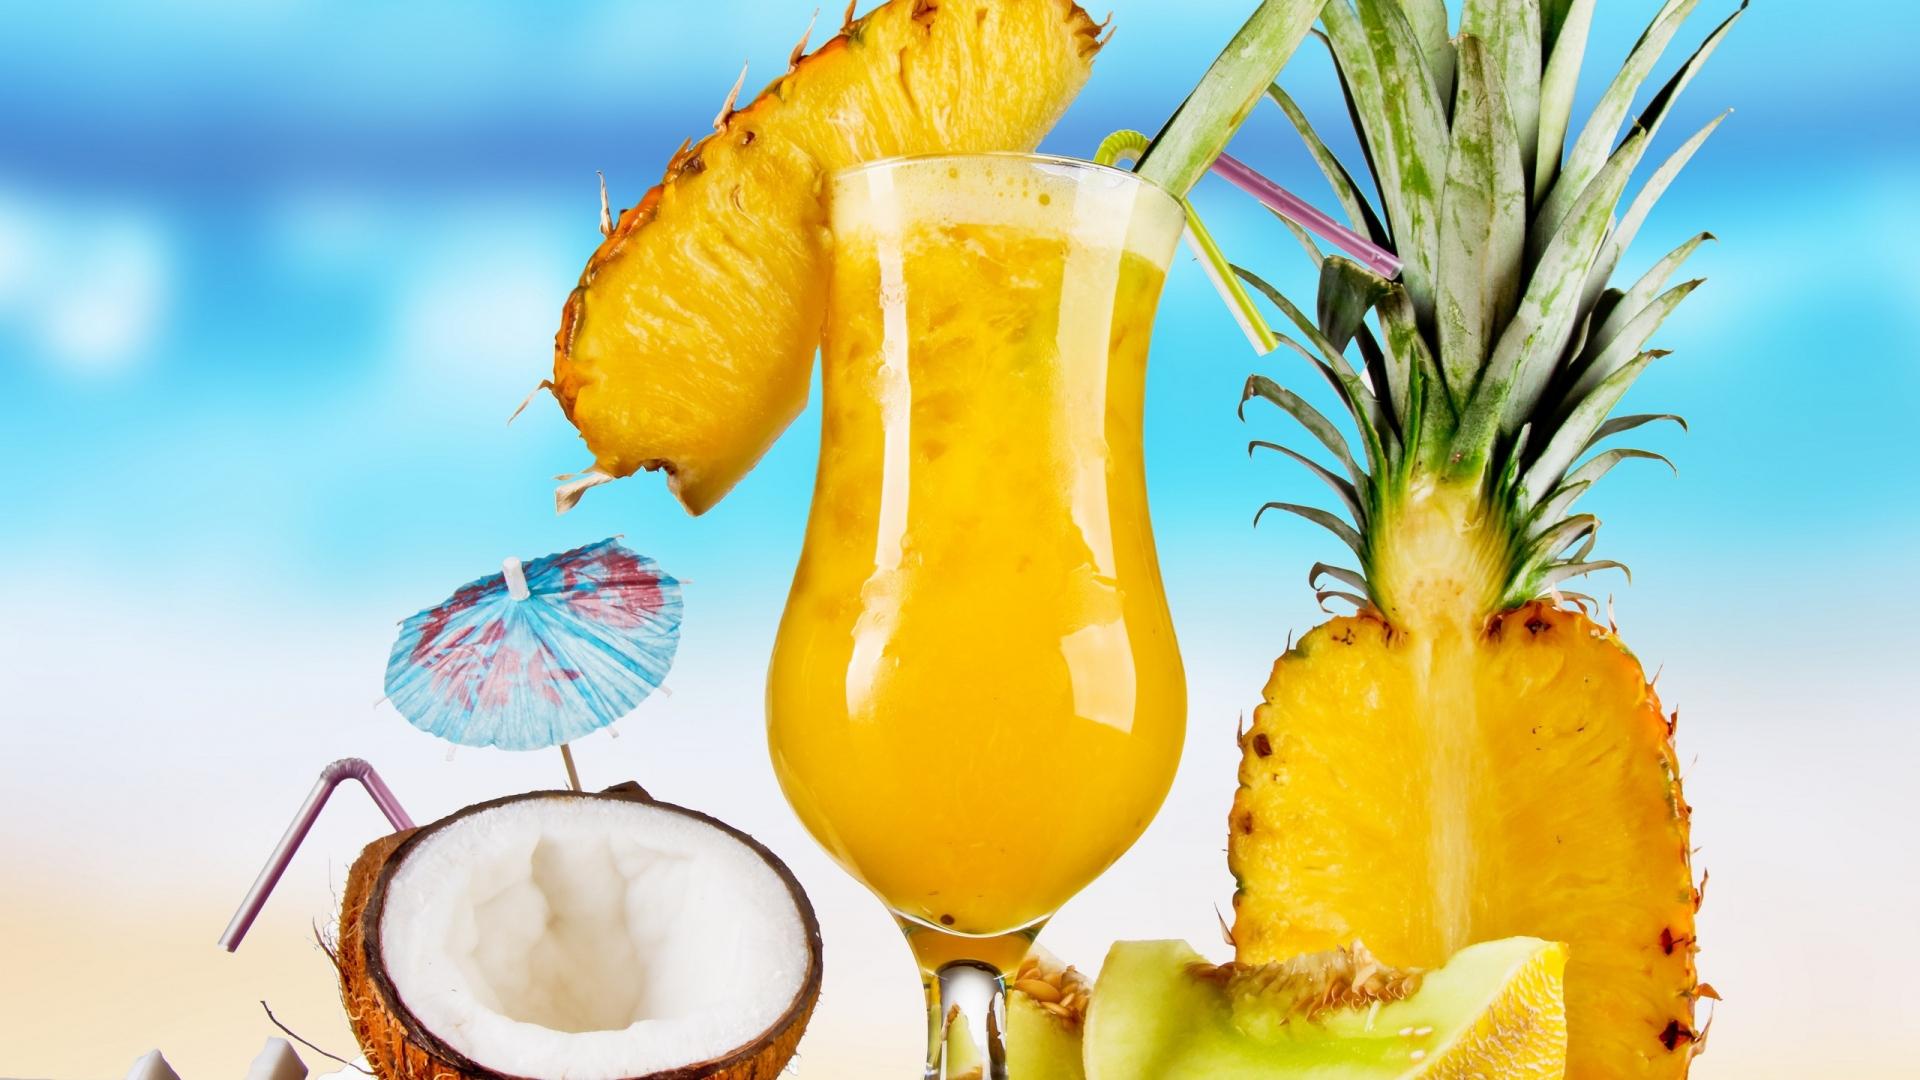 pineapple desktop wallpaper - photo #28